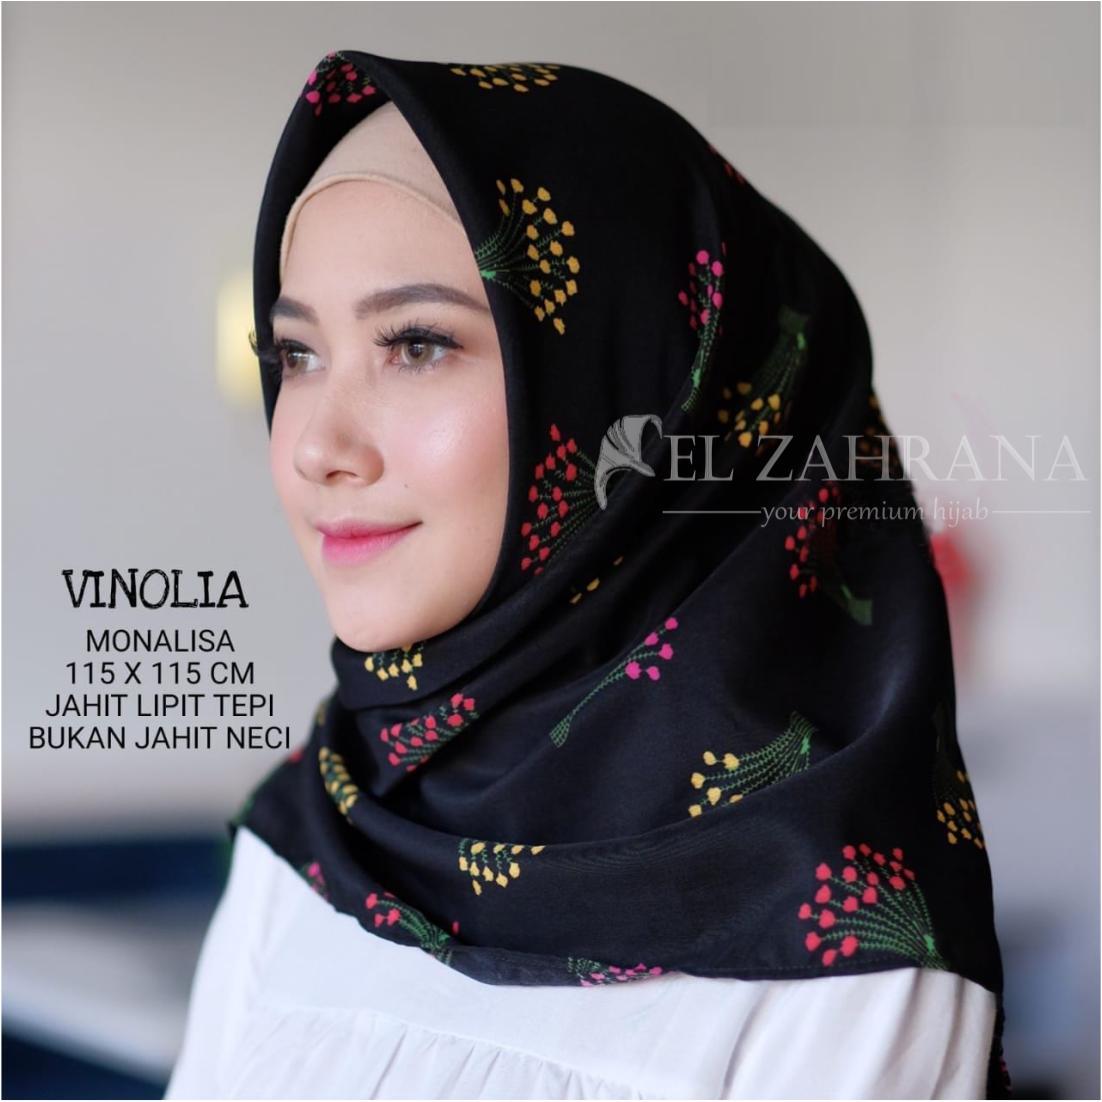 El Zahrana Kerudung Segi Empat - Hijab Segi Empat - Hijab Motif Premium – Hijab Fashion